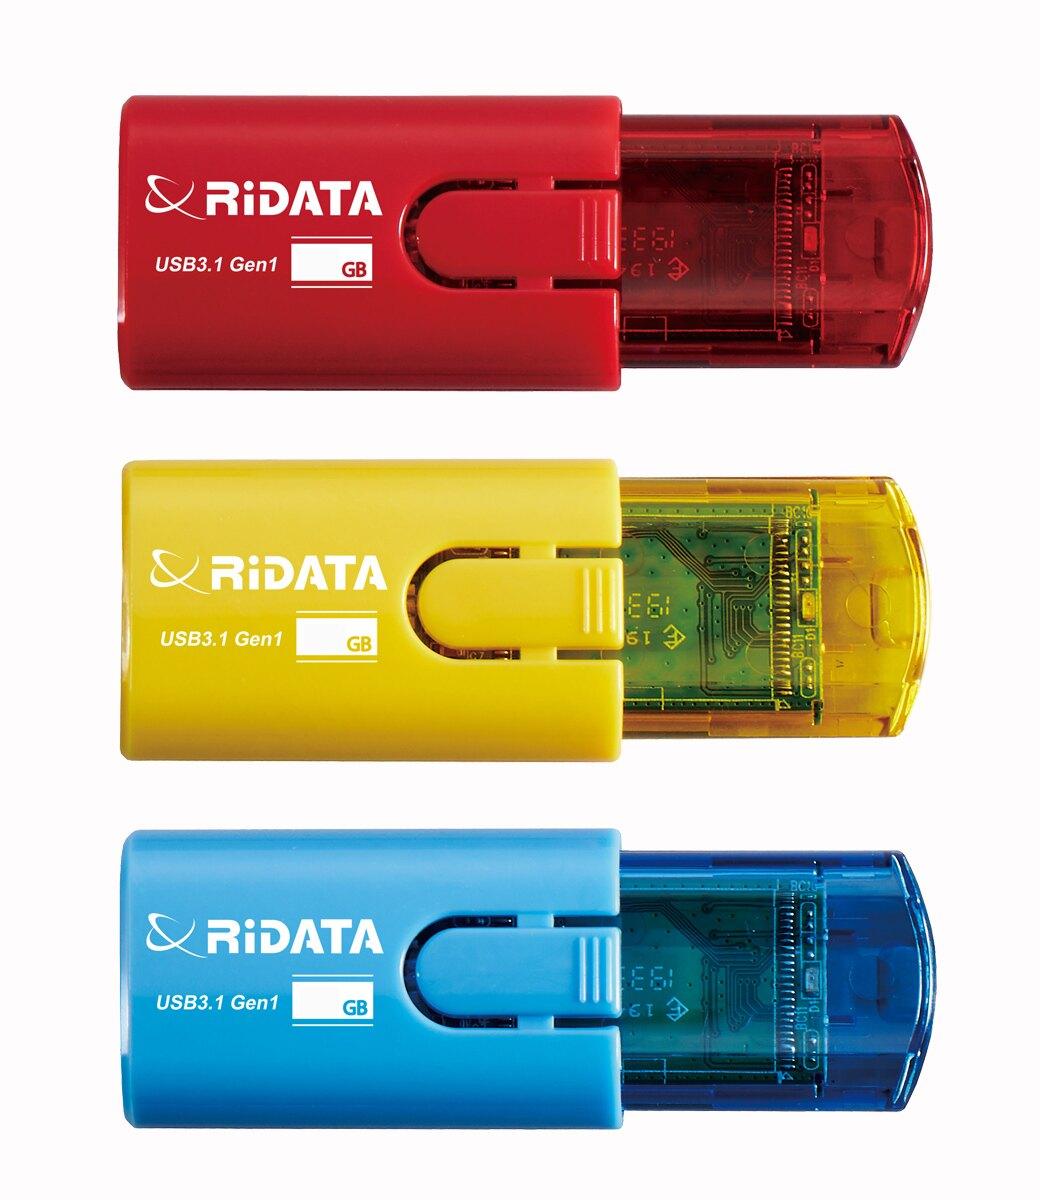 【RiDATA錸德】 進擊碟 USB3.1 /個 HD18 32GB (顏色隨機出貨)